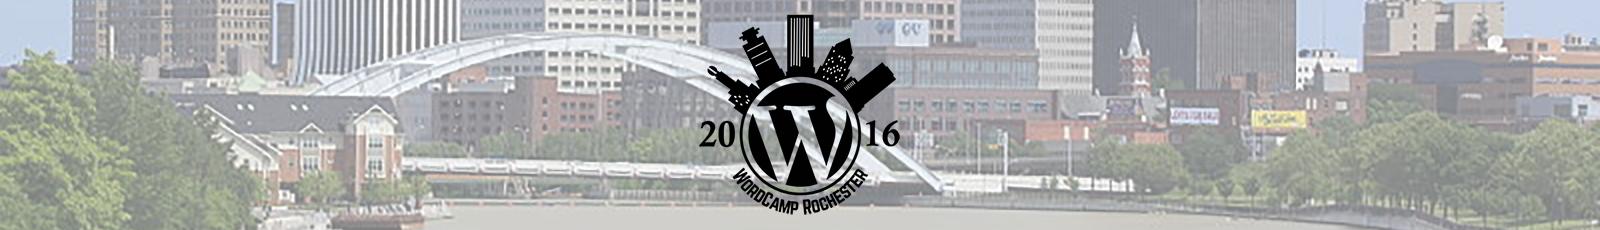 wcroc | October 15, 2016